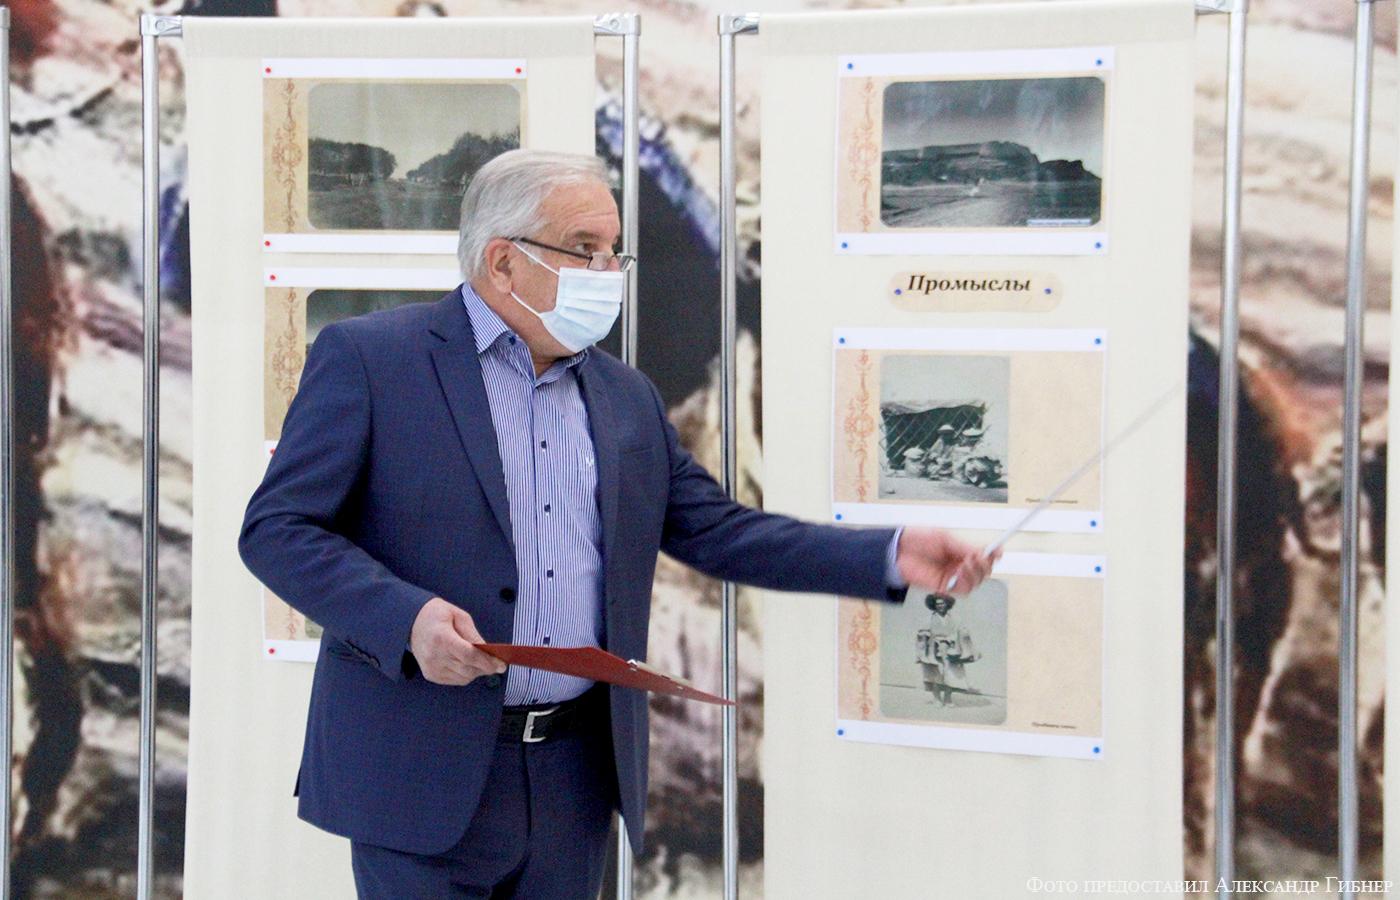 Александр Кун – востоковед, автор Туркестанского альбома